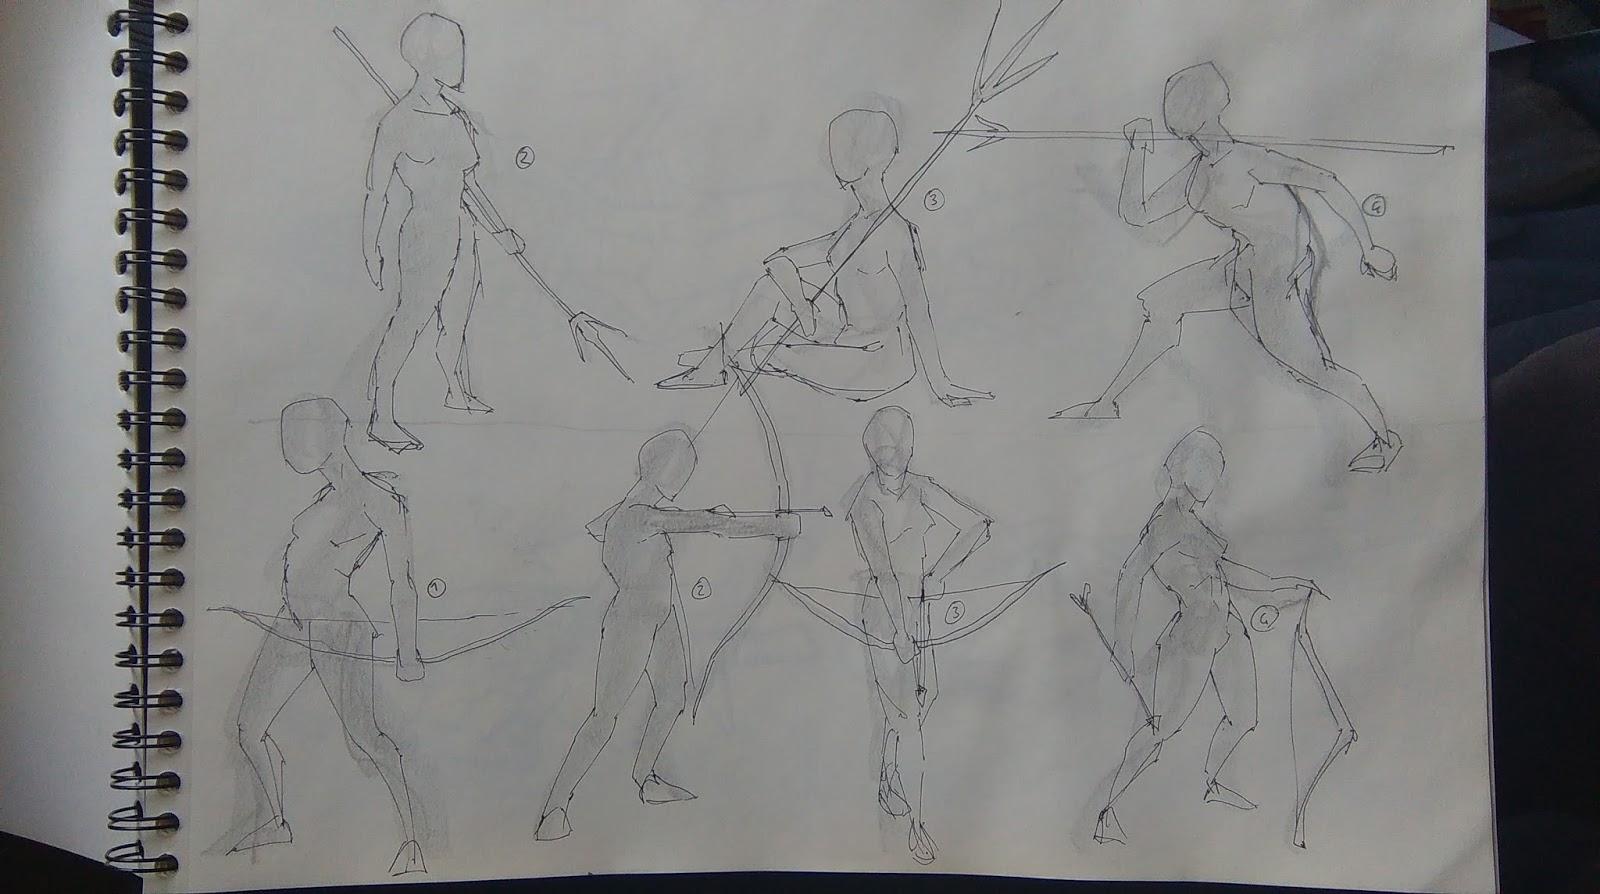 [SPOLYK] - Geometries & sketches IMAG0007_BURST003